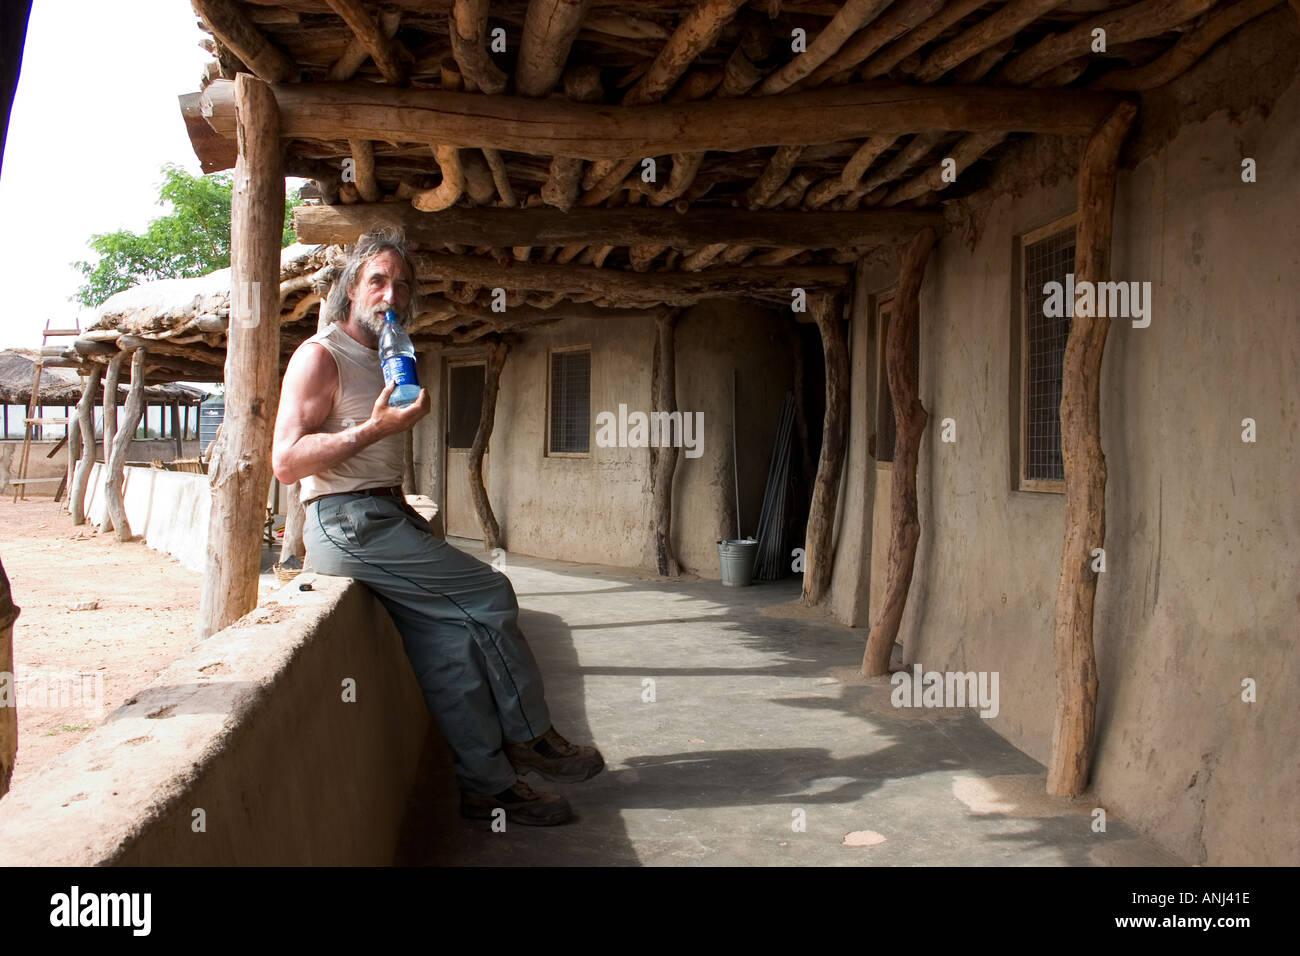 Tourist on the veranda of the lodge Wechiau Hippo Sanctuary northwestern Ghana Community Eco Tourism venture - Stock Image